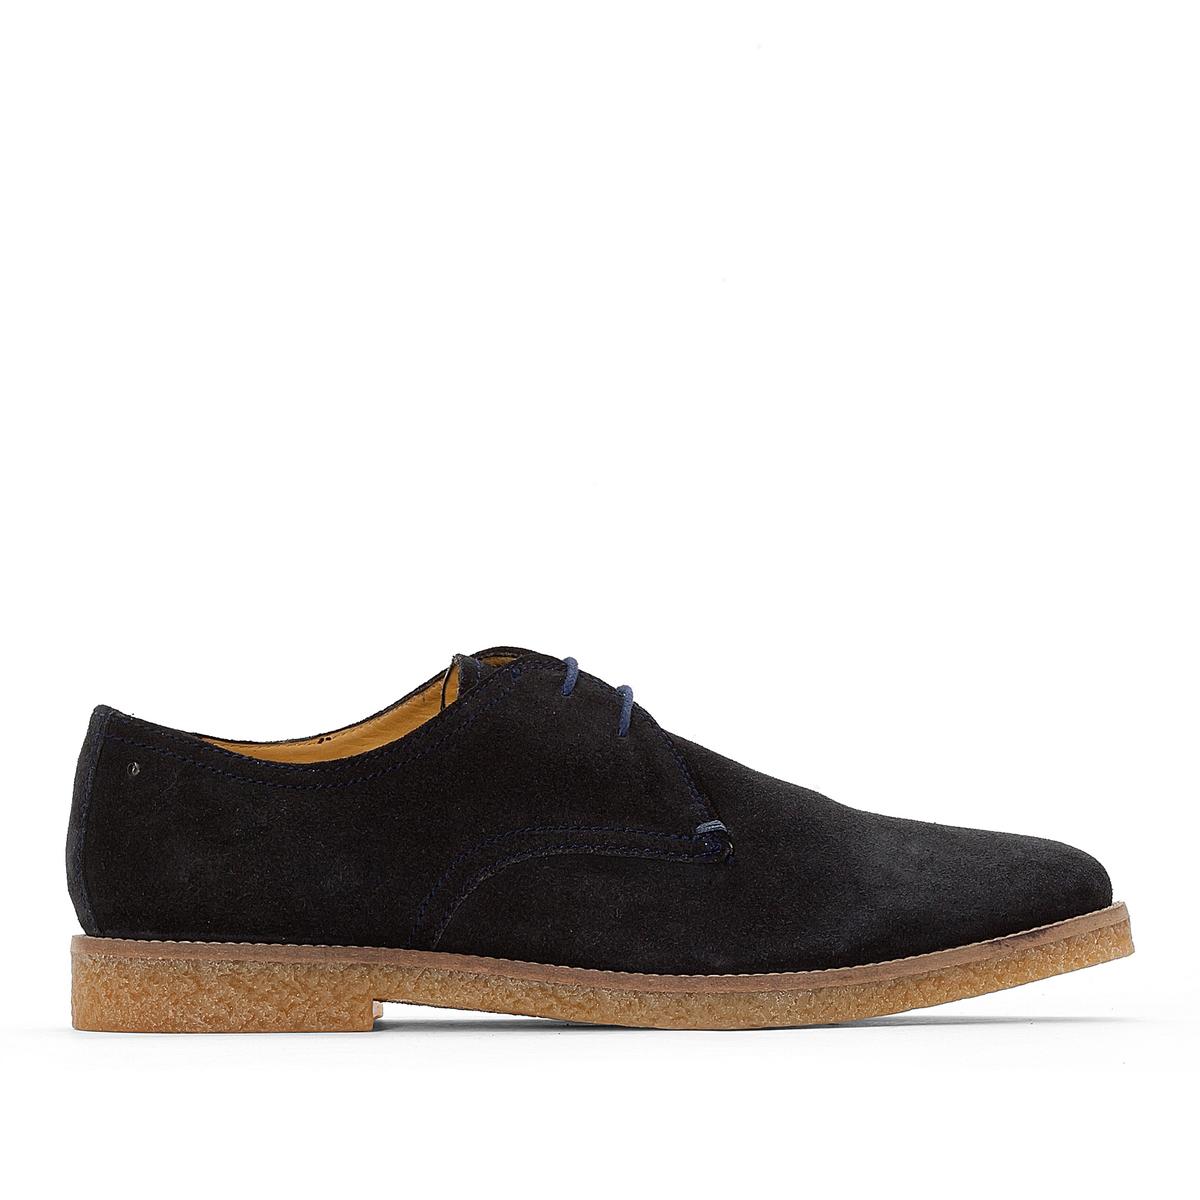 Ботинки-дерби кожаные Whitlock